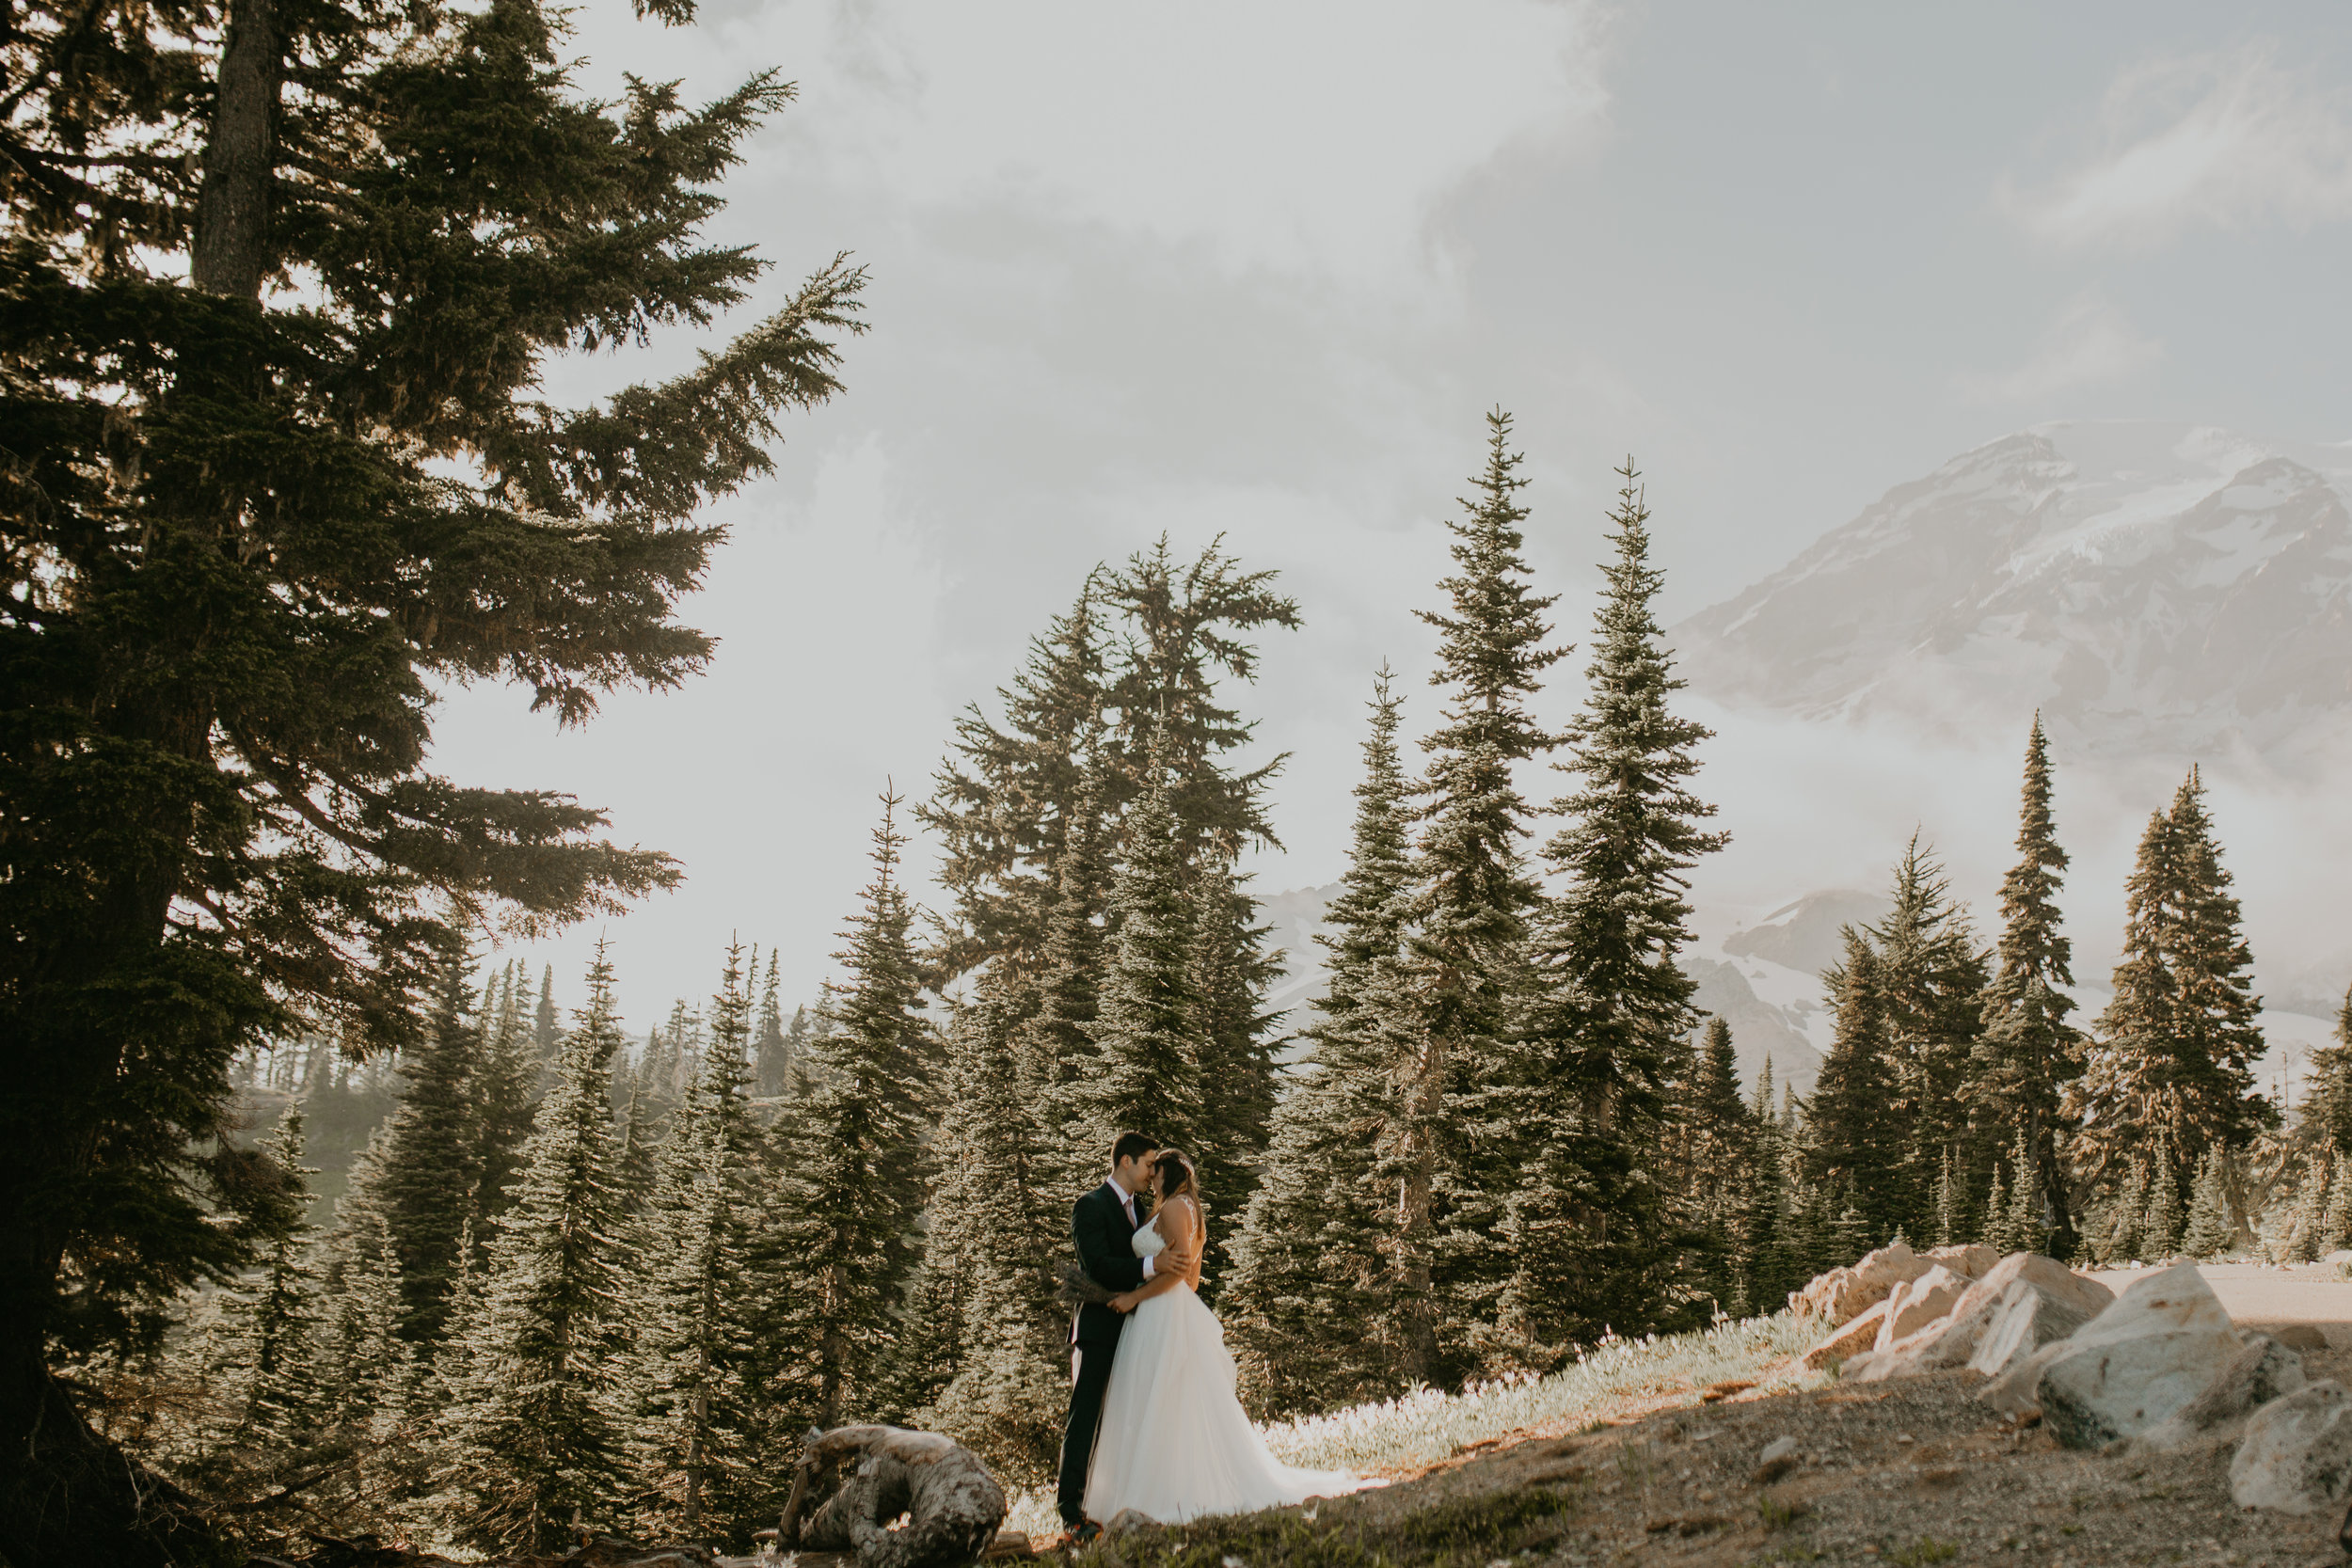 Nicole-Daacke-Photography-Mt-Rainier-elopement-photographer-washington-mountain-epic-wedding-photography-wildflowers-at-rainier-pine-tree-cloudy-summer-day-at-mountain-rainier-2.jpg